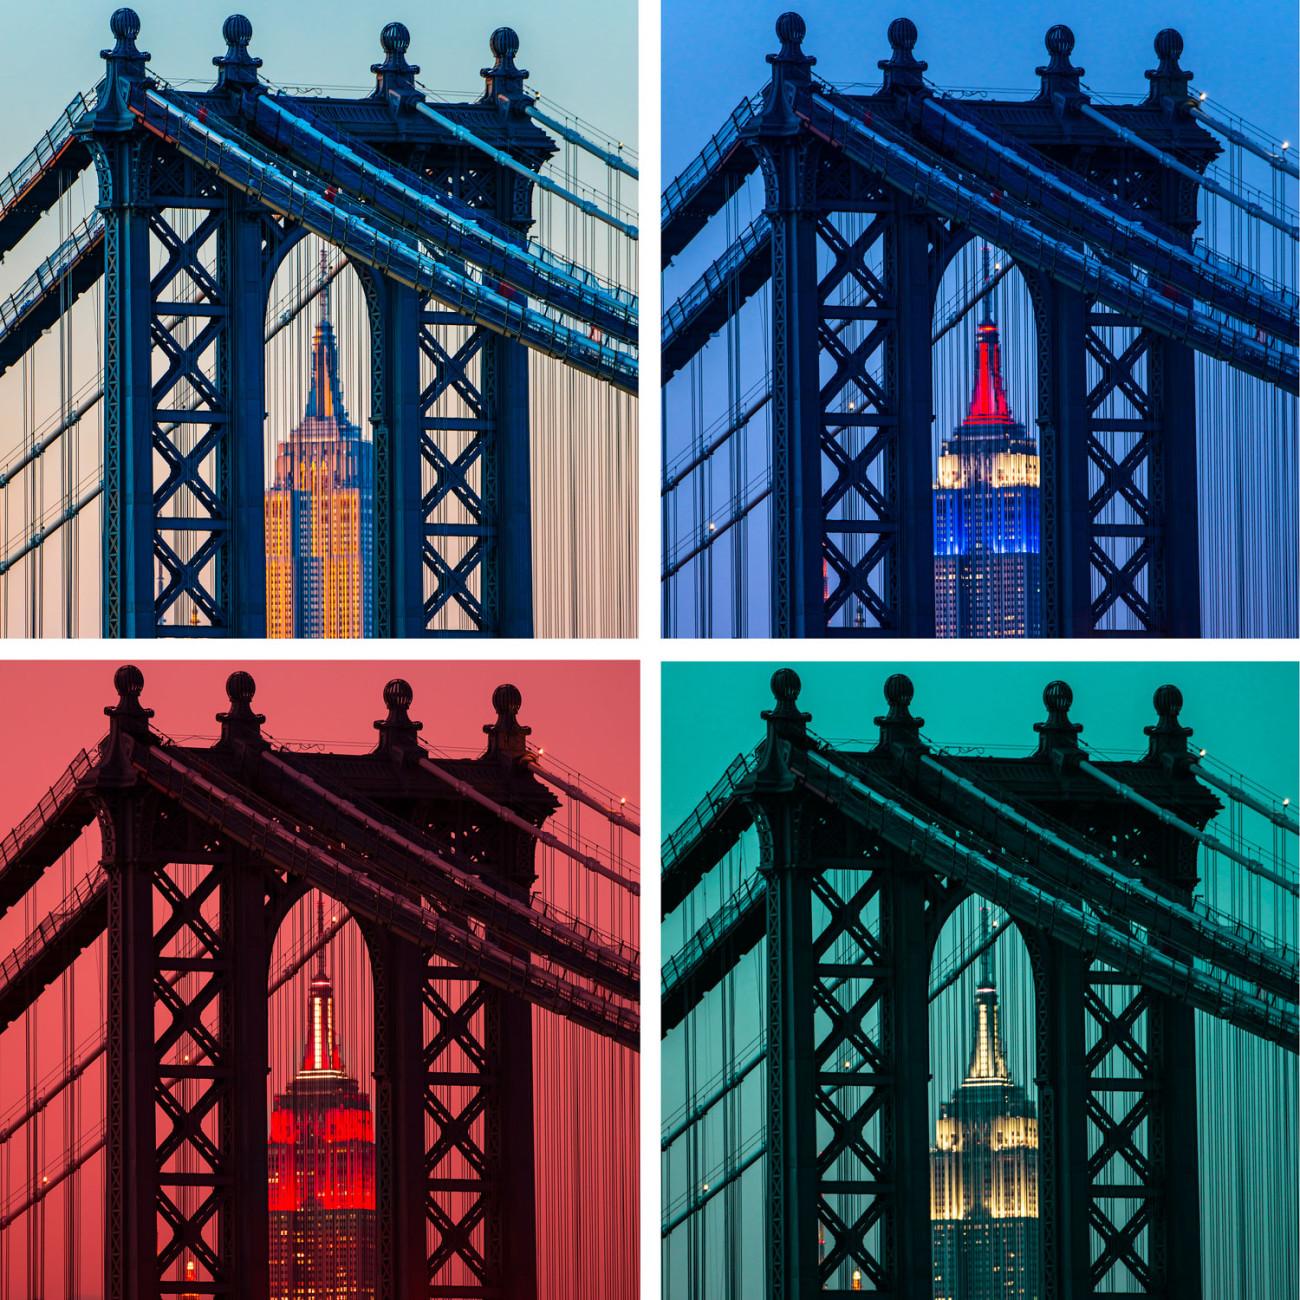 Four views of the Empire State Building through the Manhattan Br